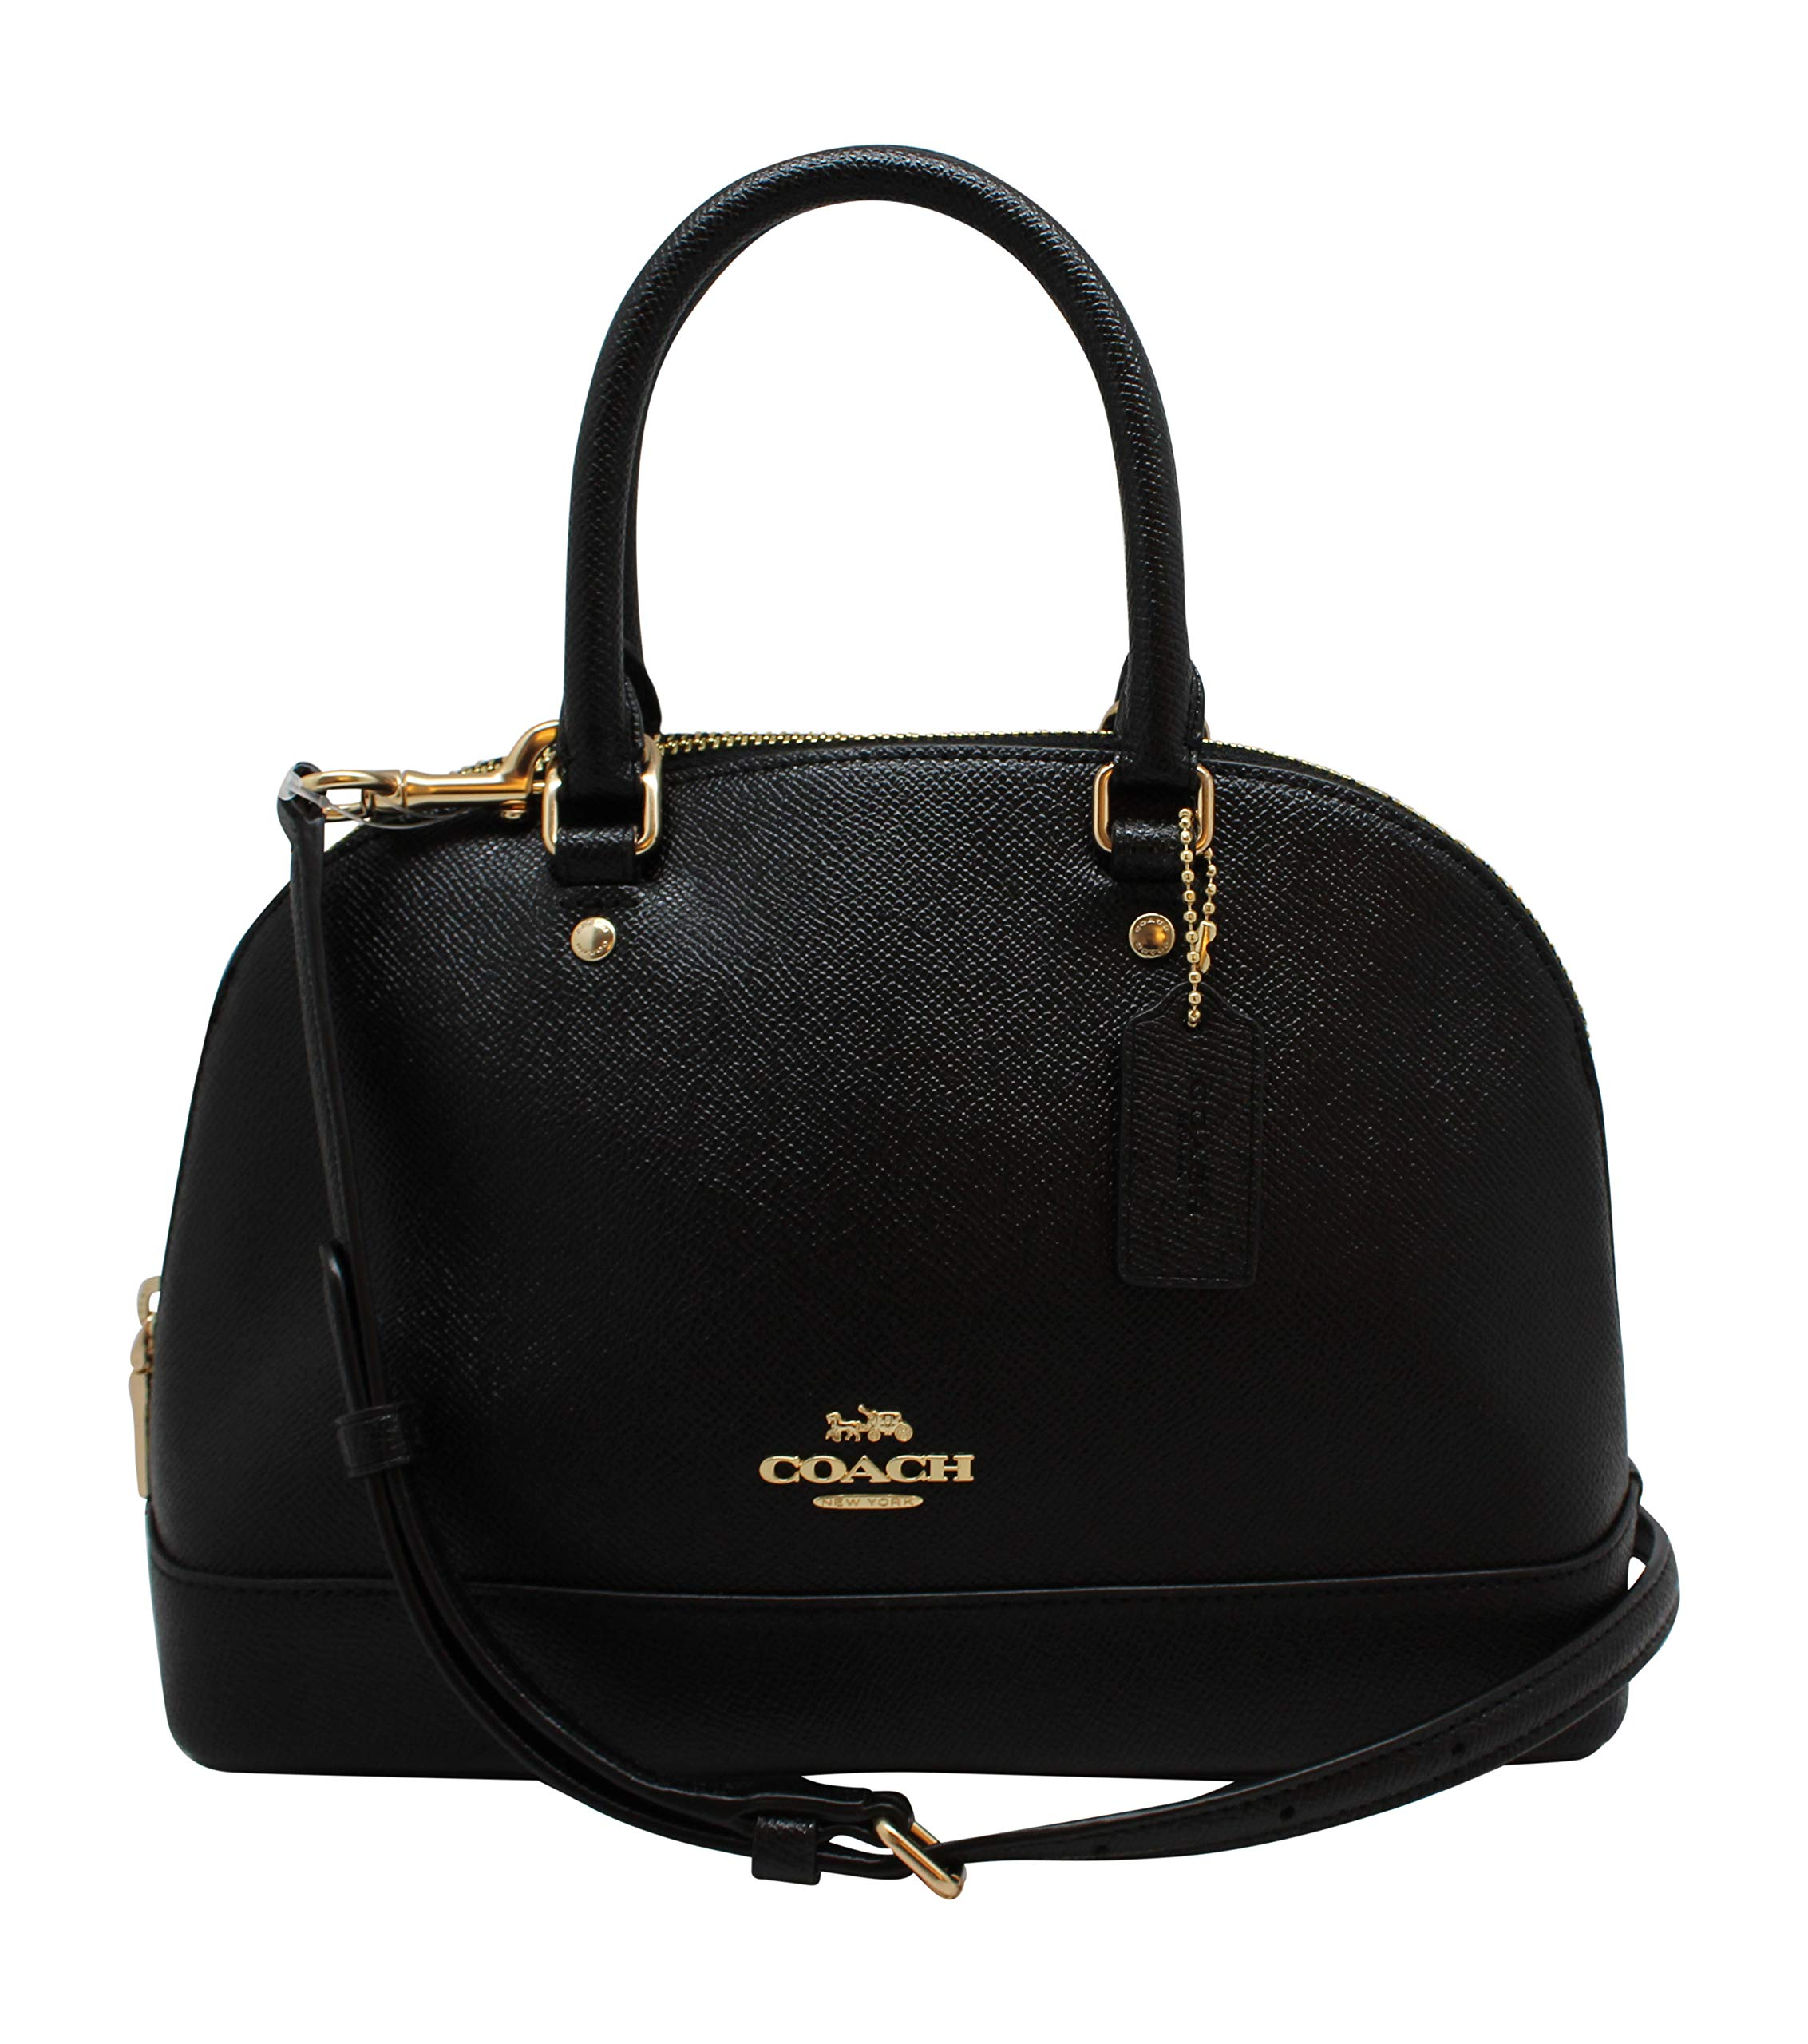 Coach Womens Mini Sierra Satchel Handbag, Crossgrain Leather, Detachable Crossbody Strap (Mini, Black)